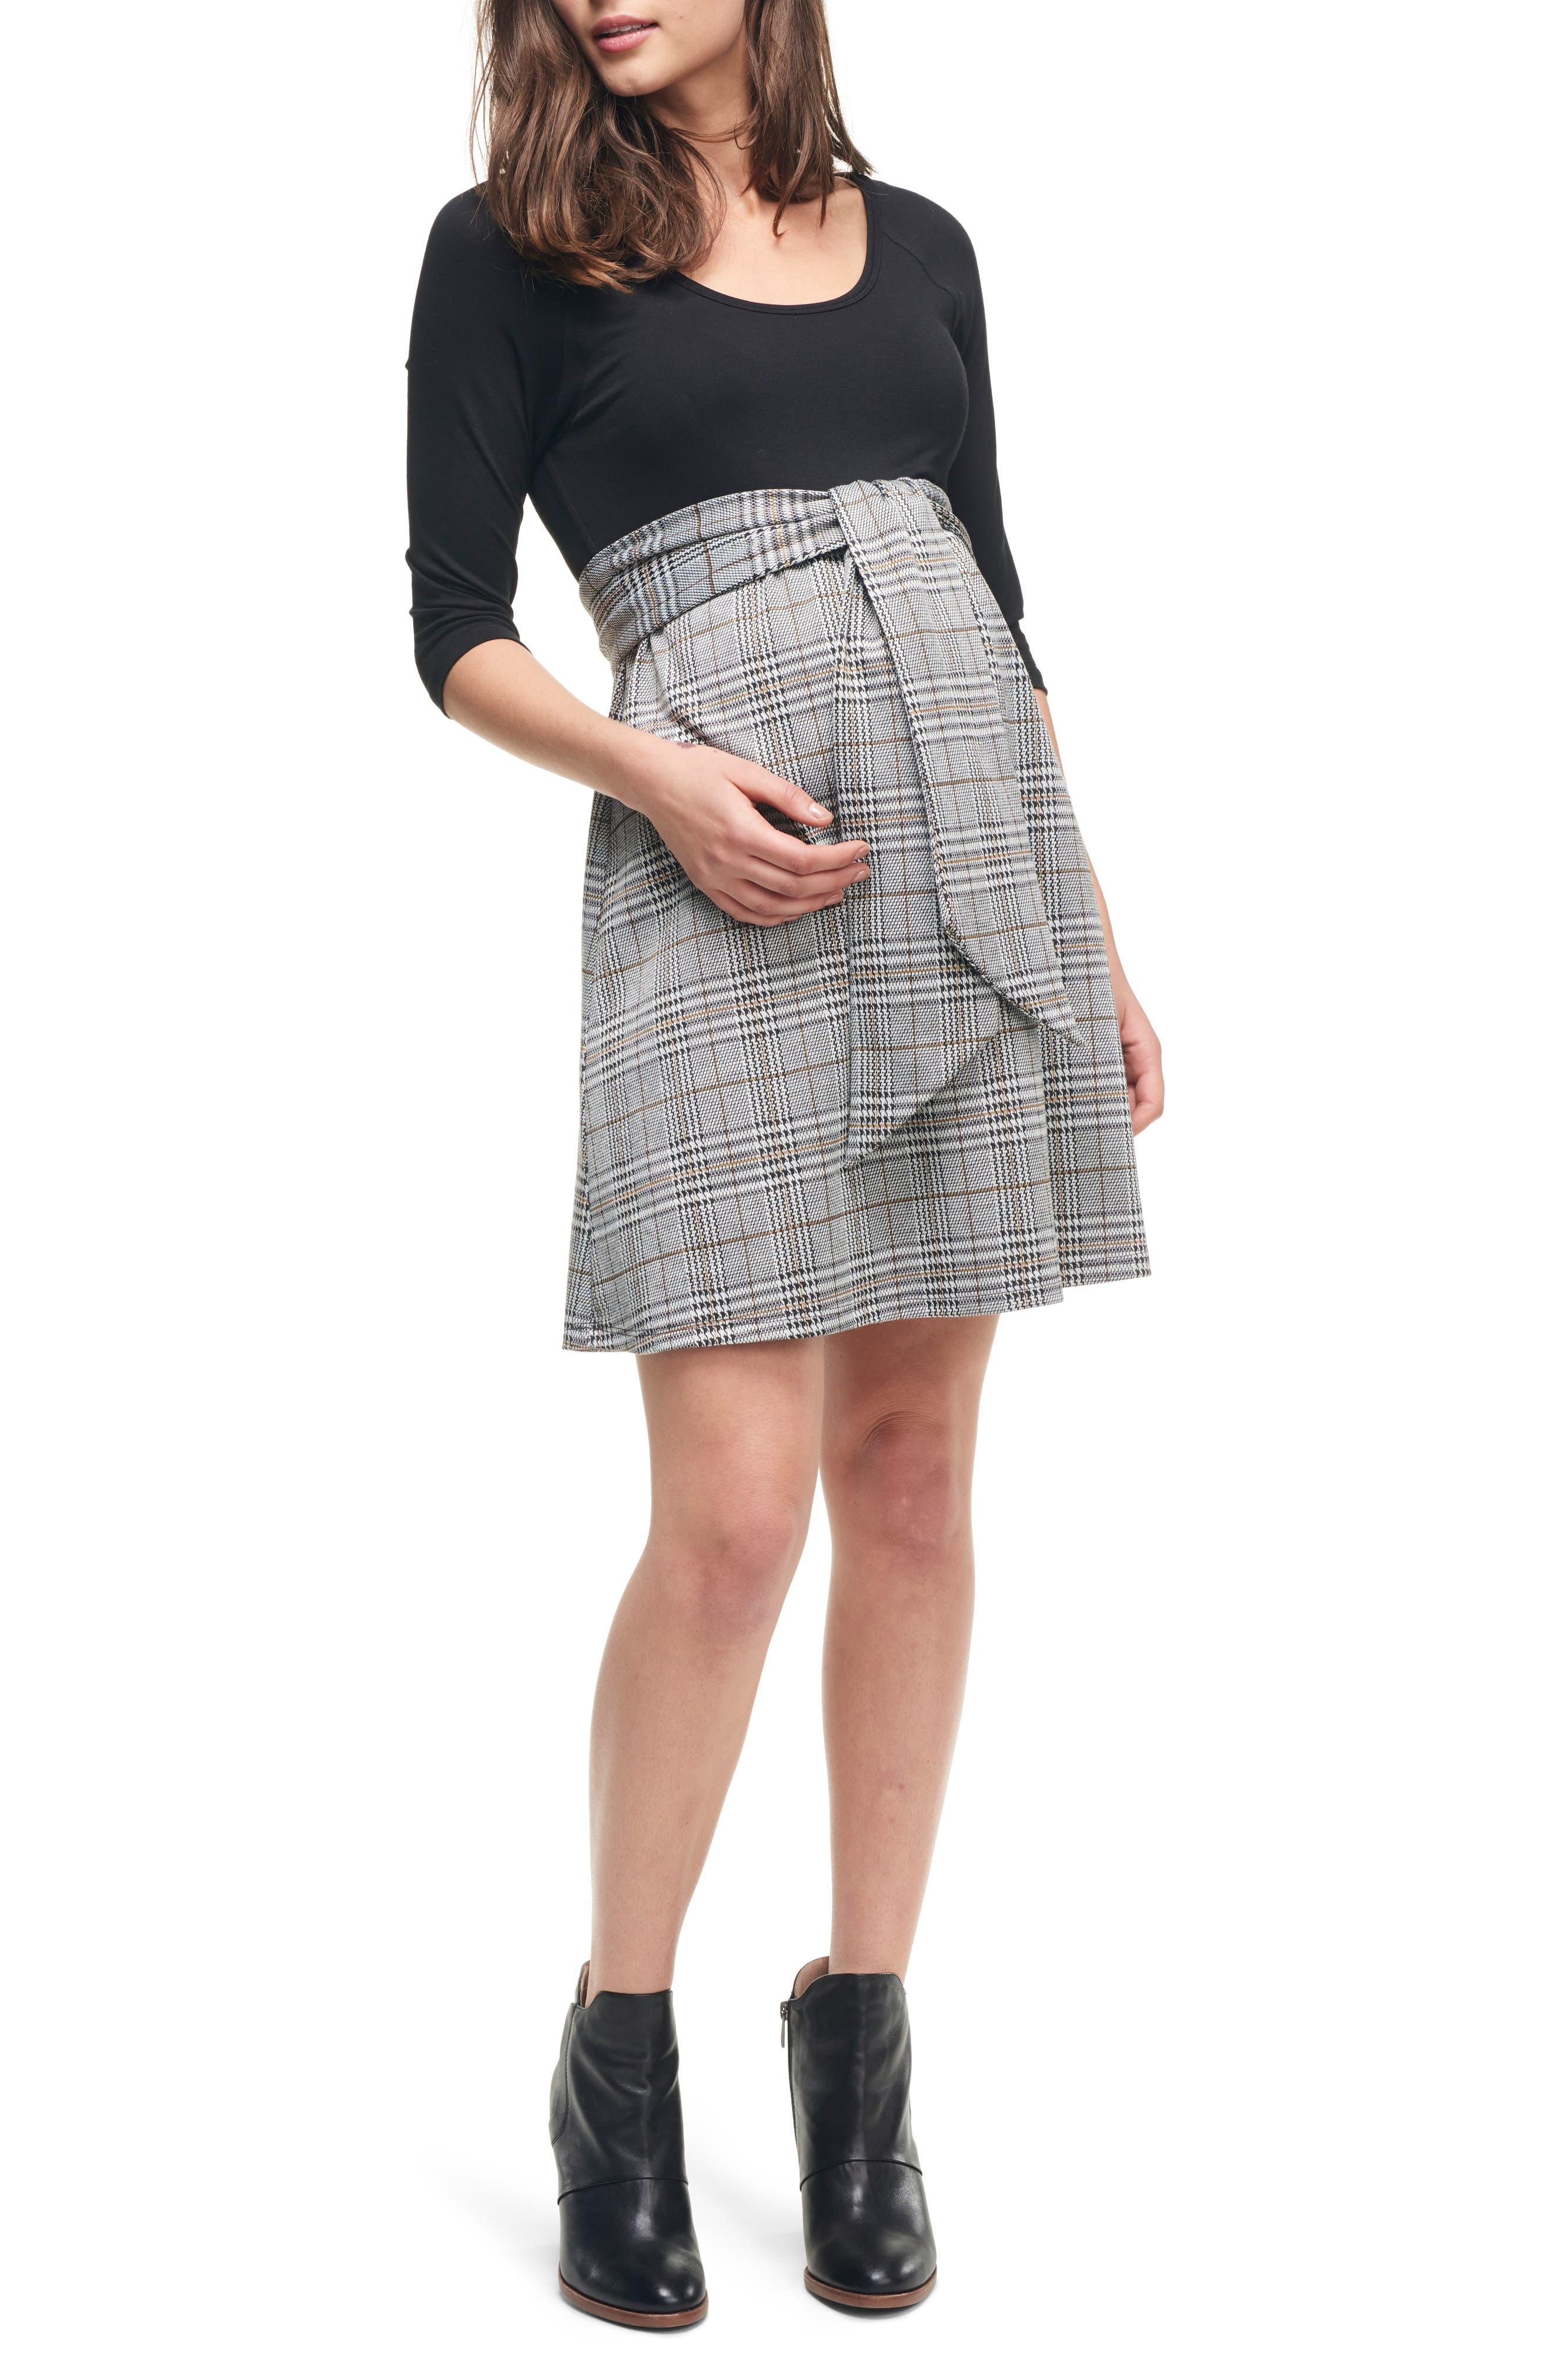 Scoop Neck Maternity Dress,                             Main thumbnail 1, color,                             BLACK/ PLAID